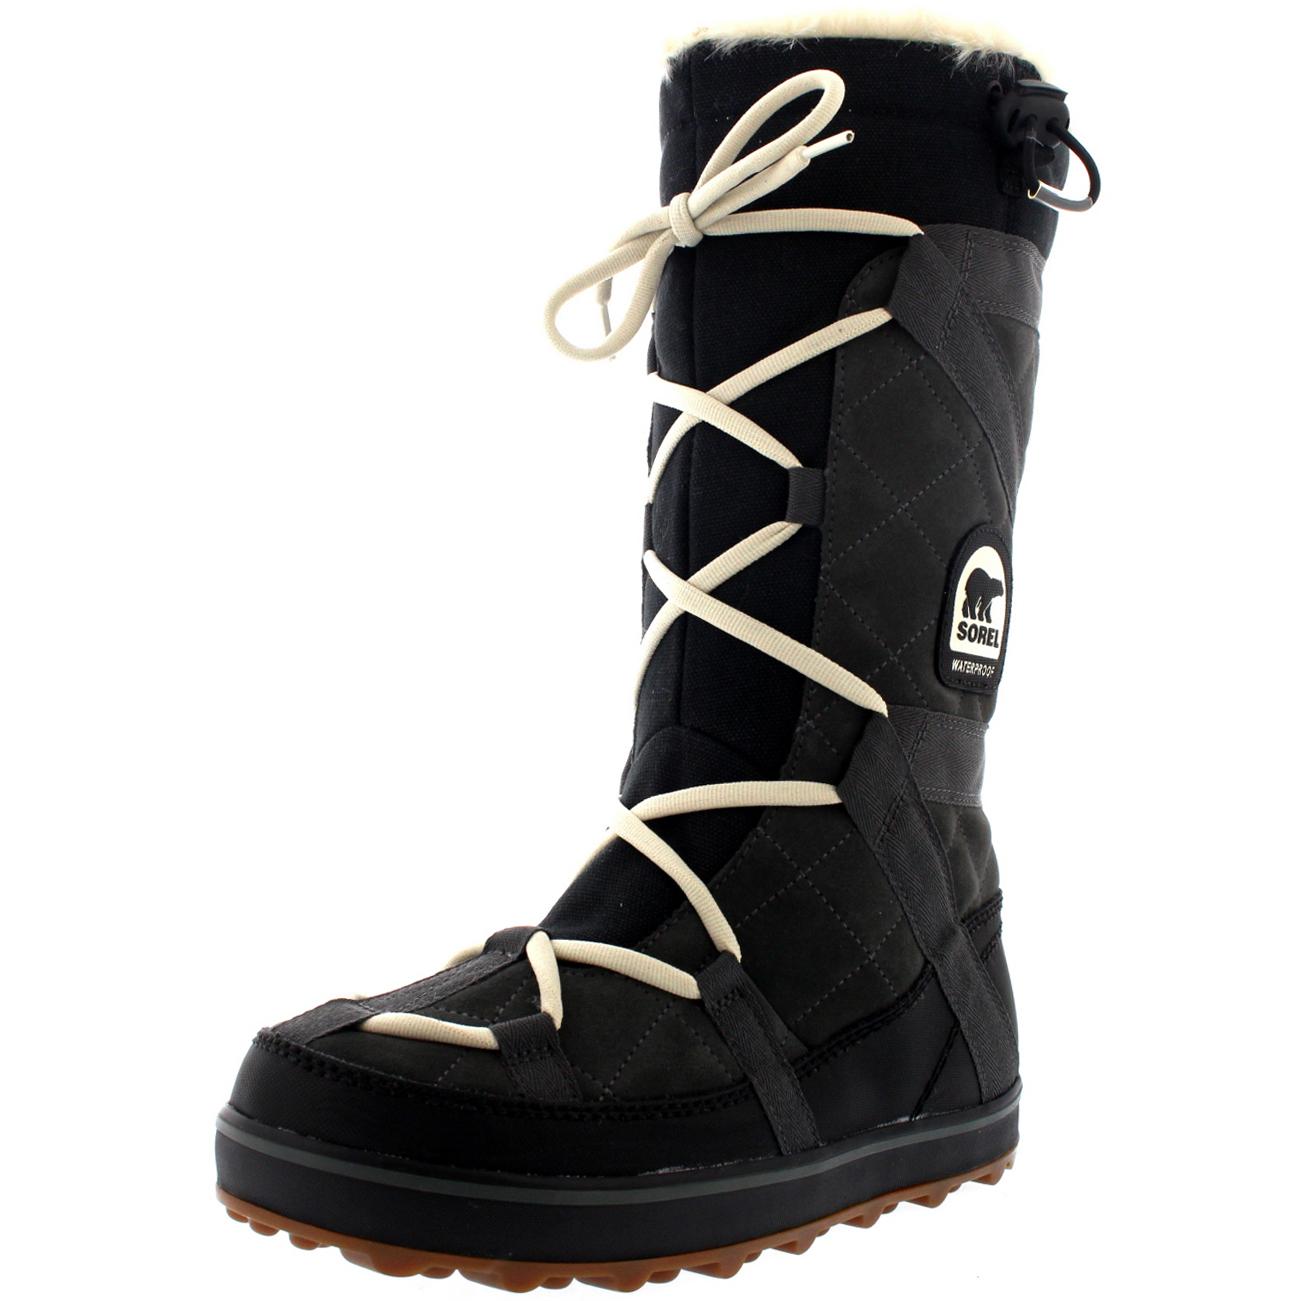 Ladies Sorel Glacy Explorer Winter Fur Lace Up Waterproof Warm ...